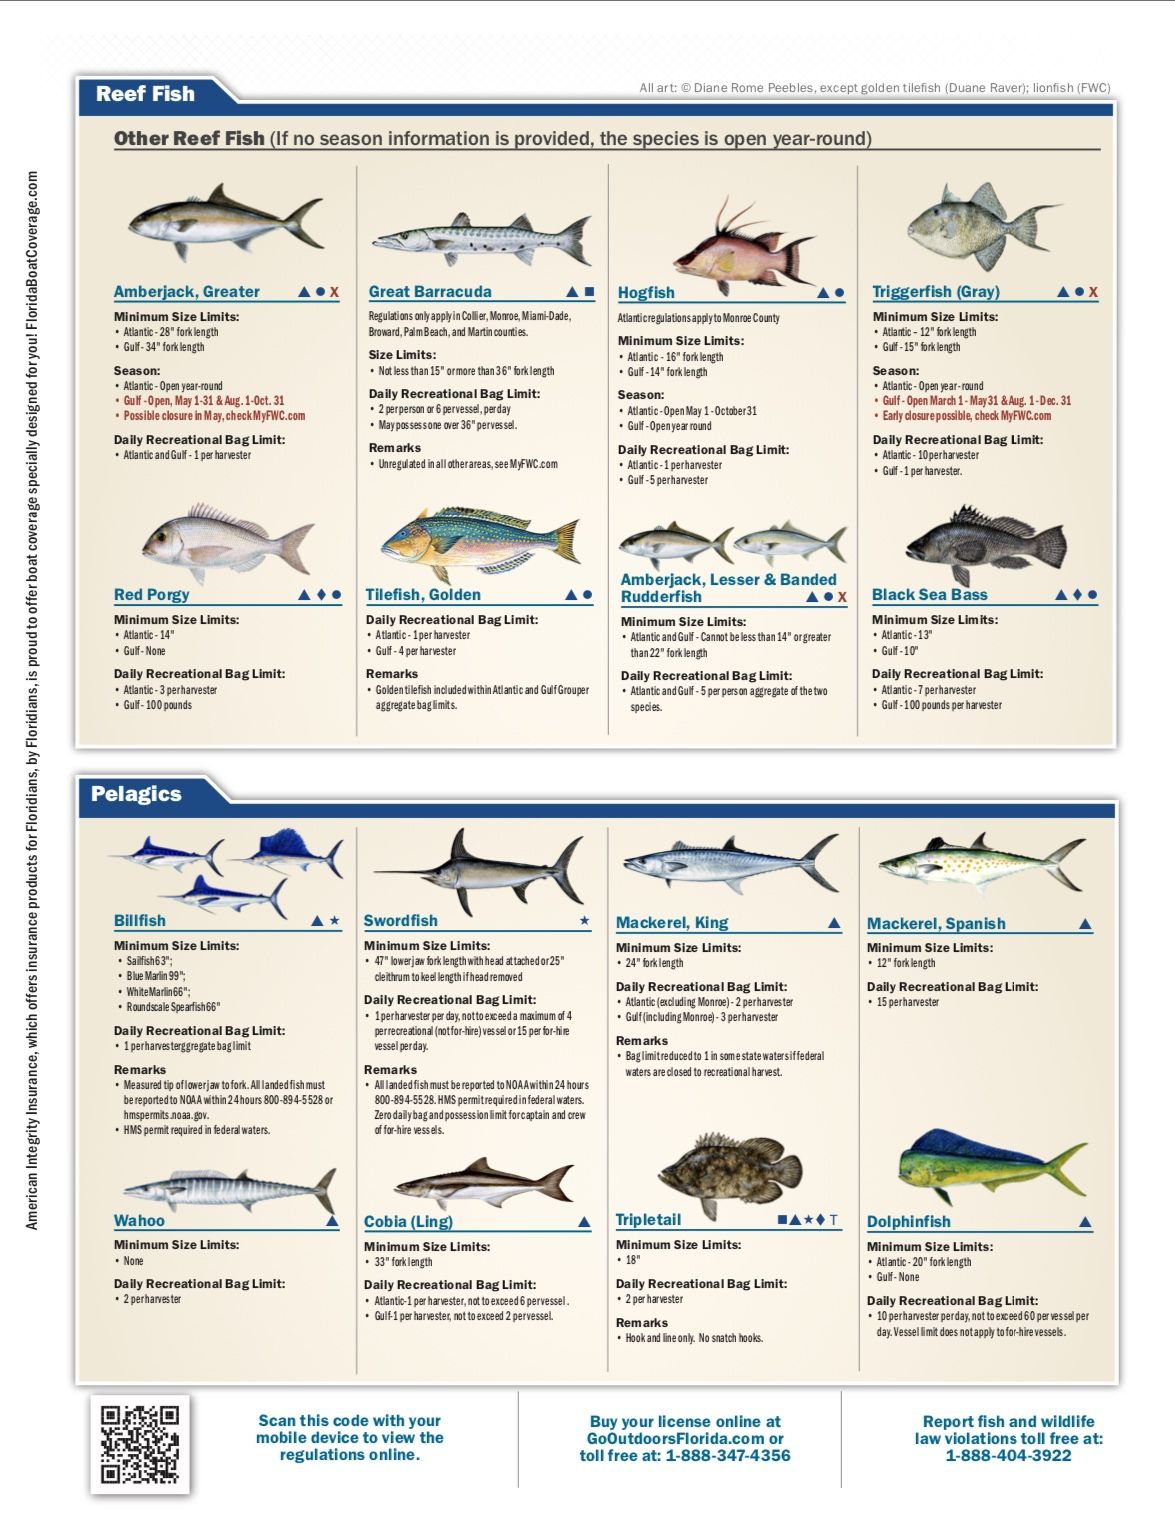 Saltwater Fishing Regulations Pt 2 Fish Photo Hogfish Fish